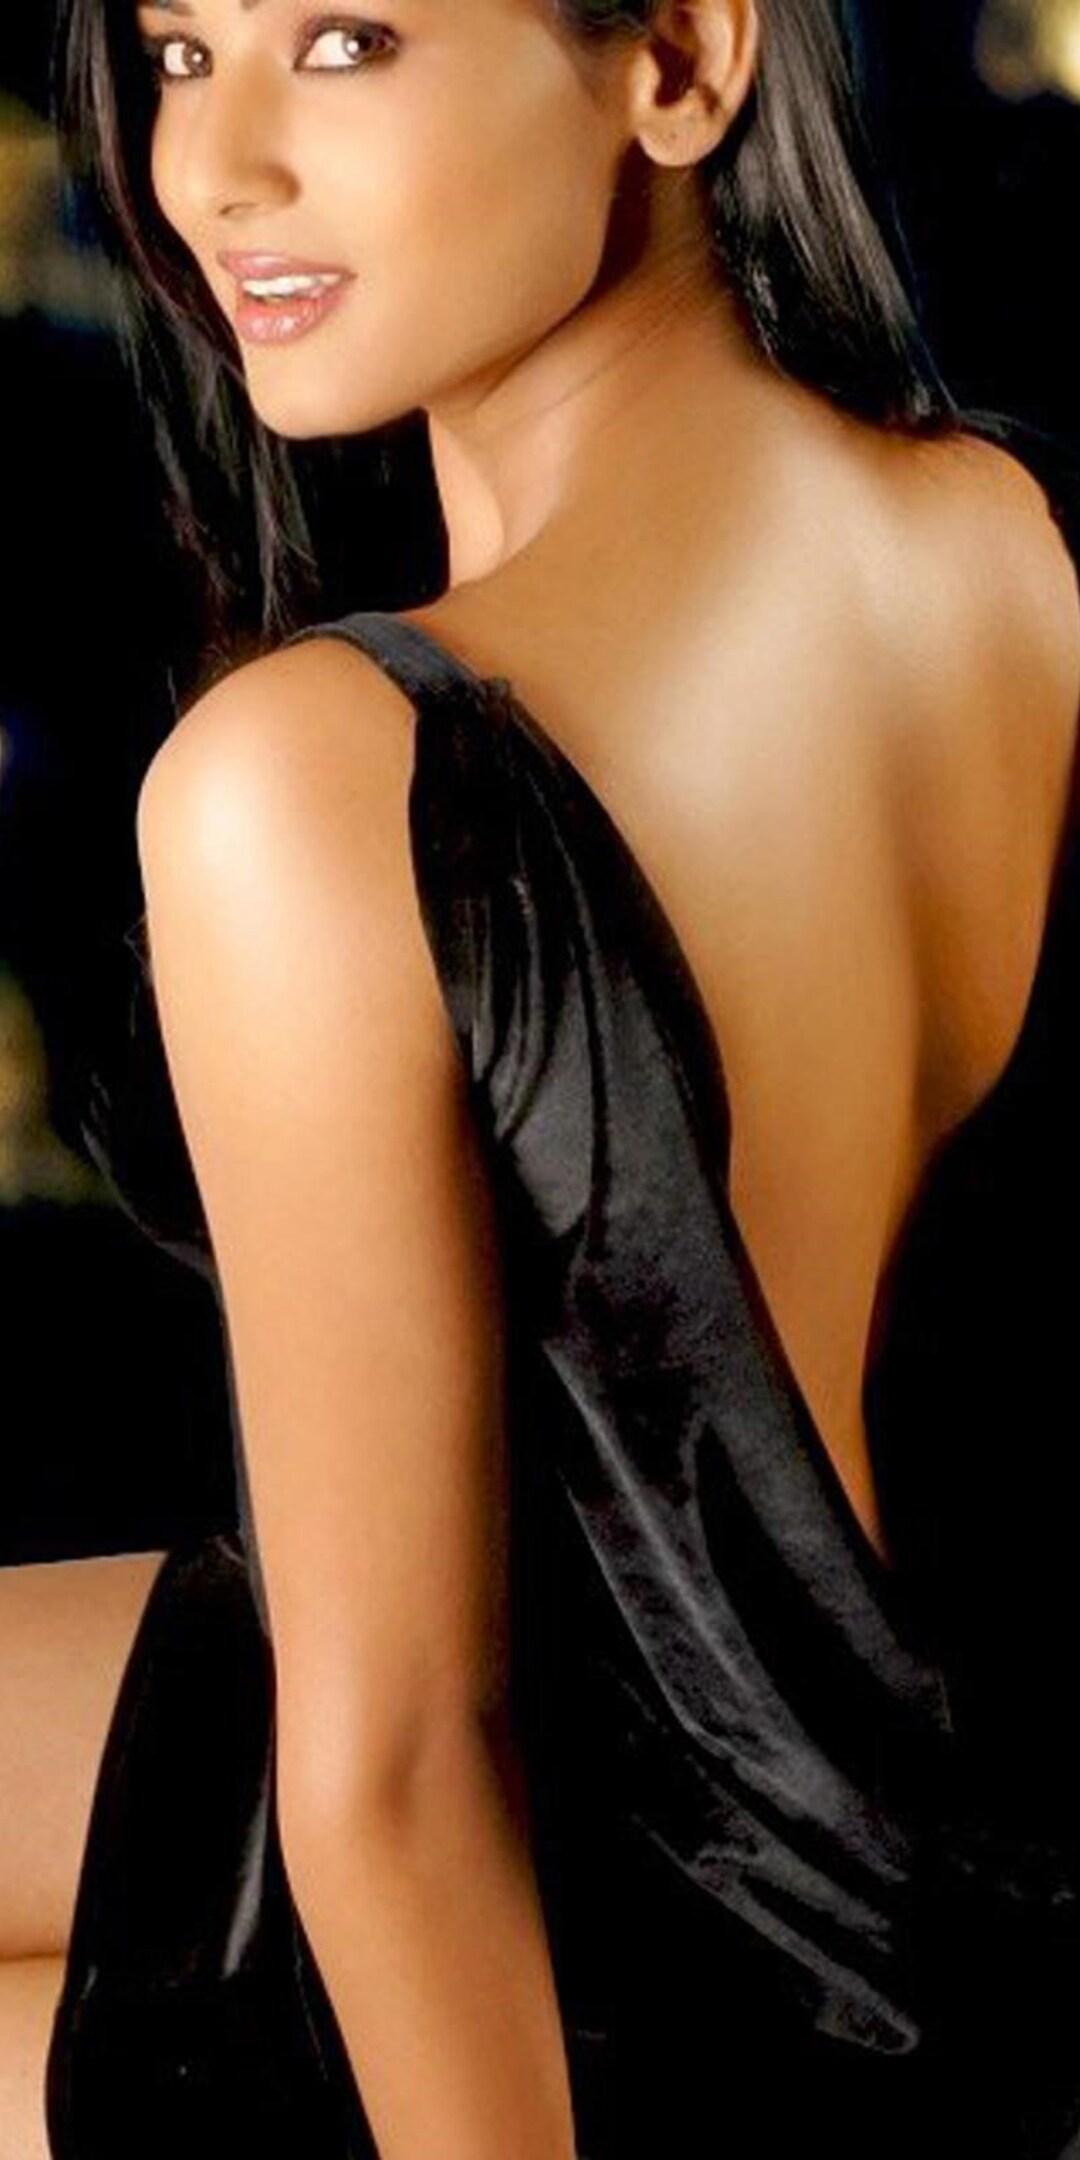 sonal-chauhan-backless-4k.jpg